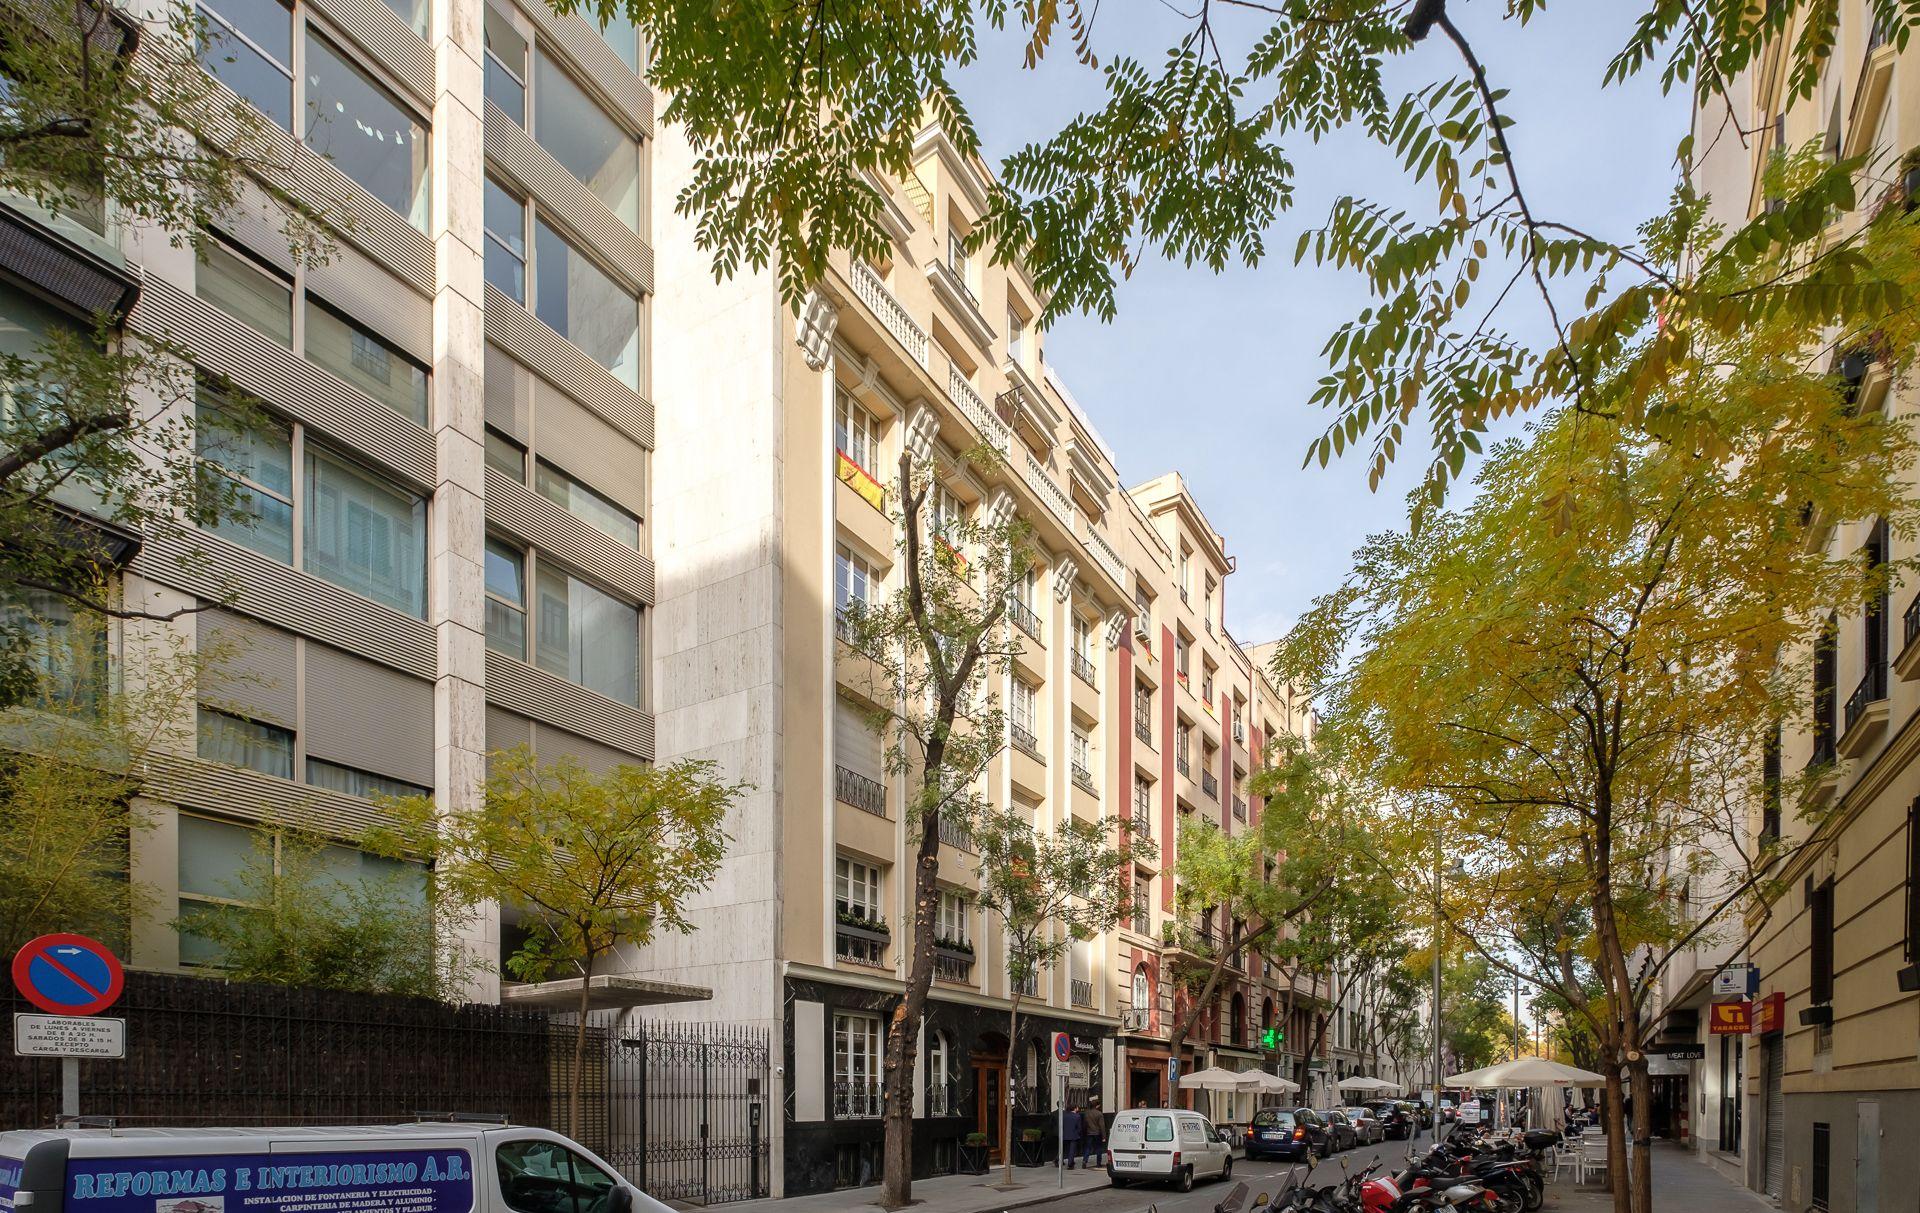 Obra reforma vivienda Madrid by UXBAN - Hermanos Becquer